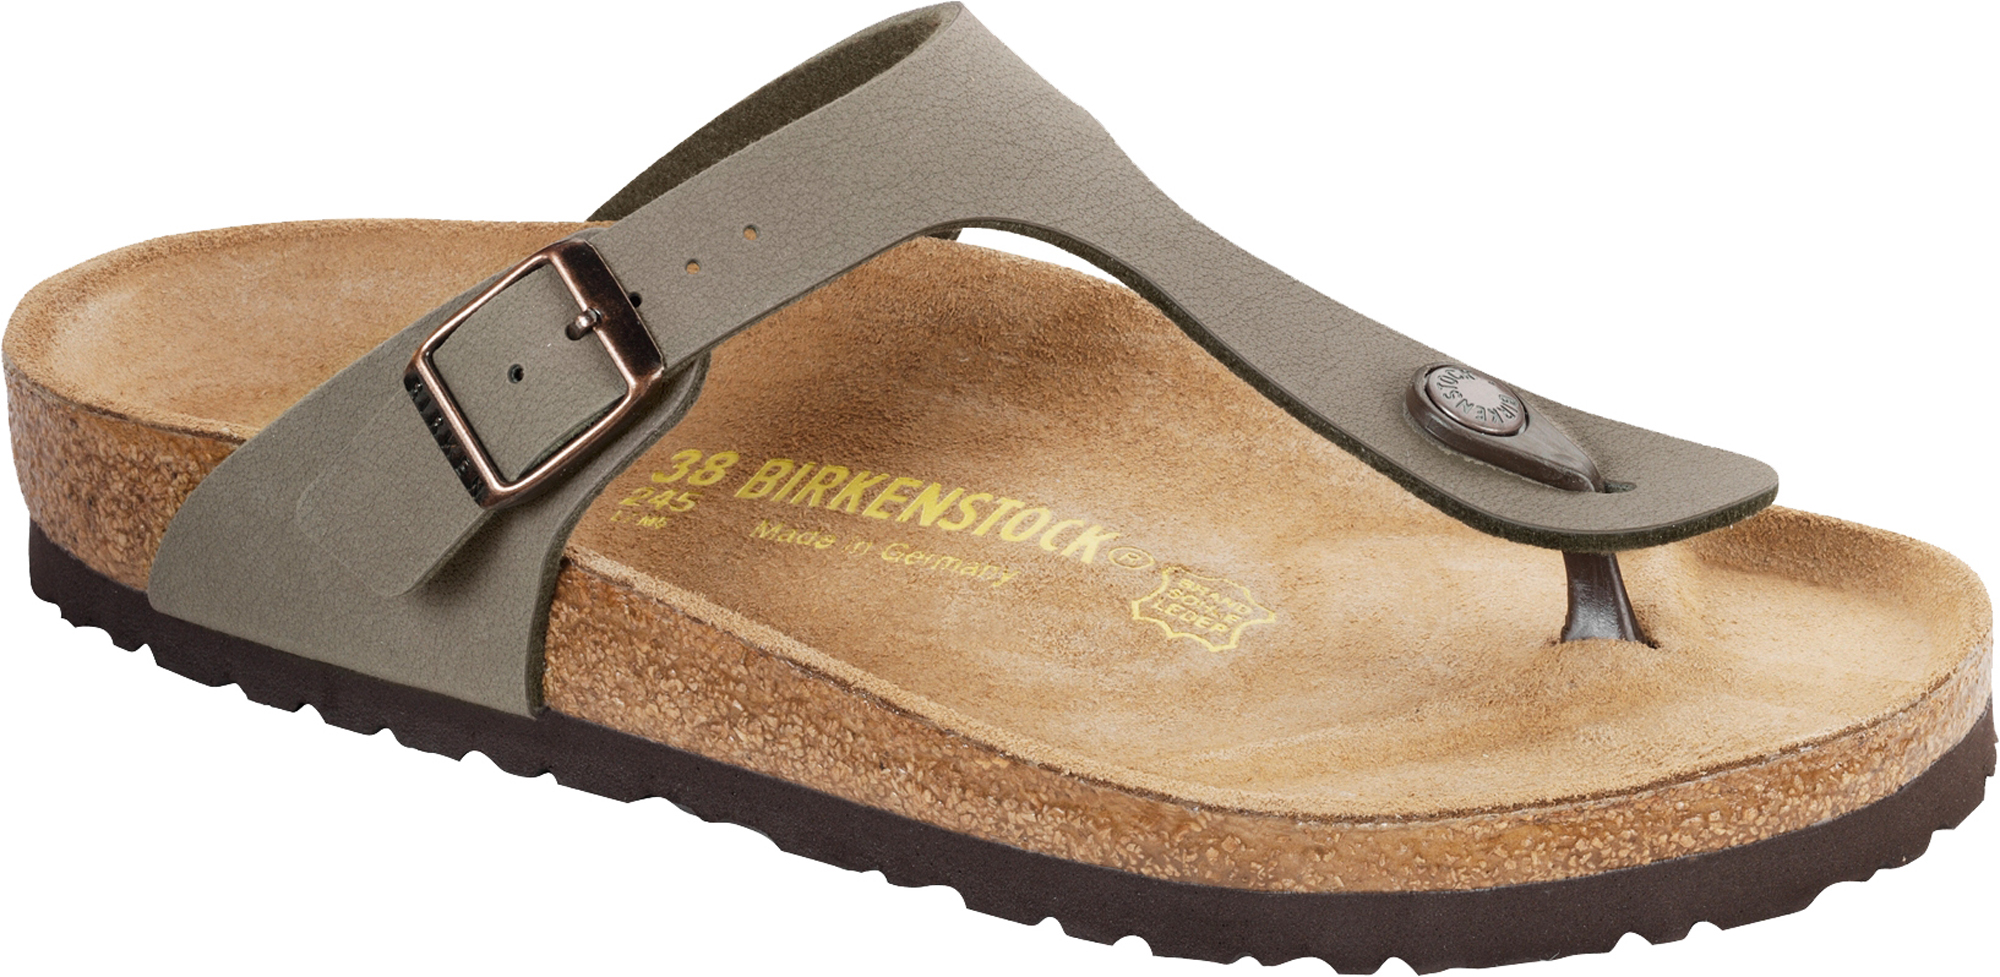 Birkenstock Gizeh Synthetic Nubuck Strap Sandales